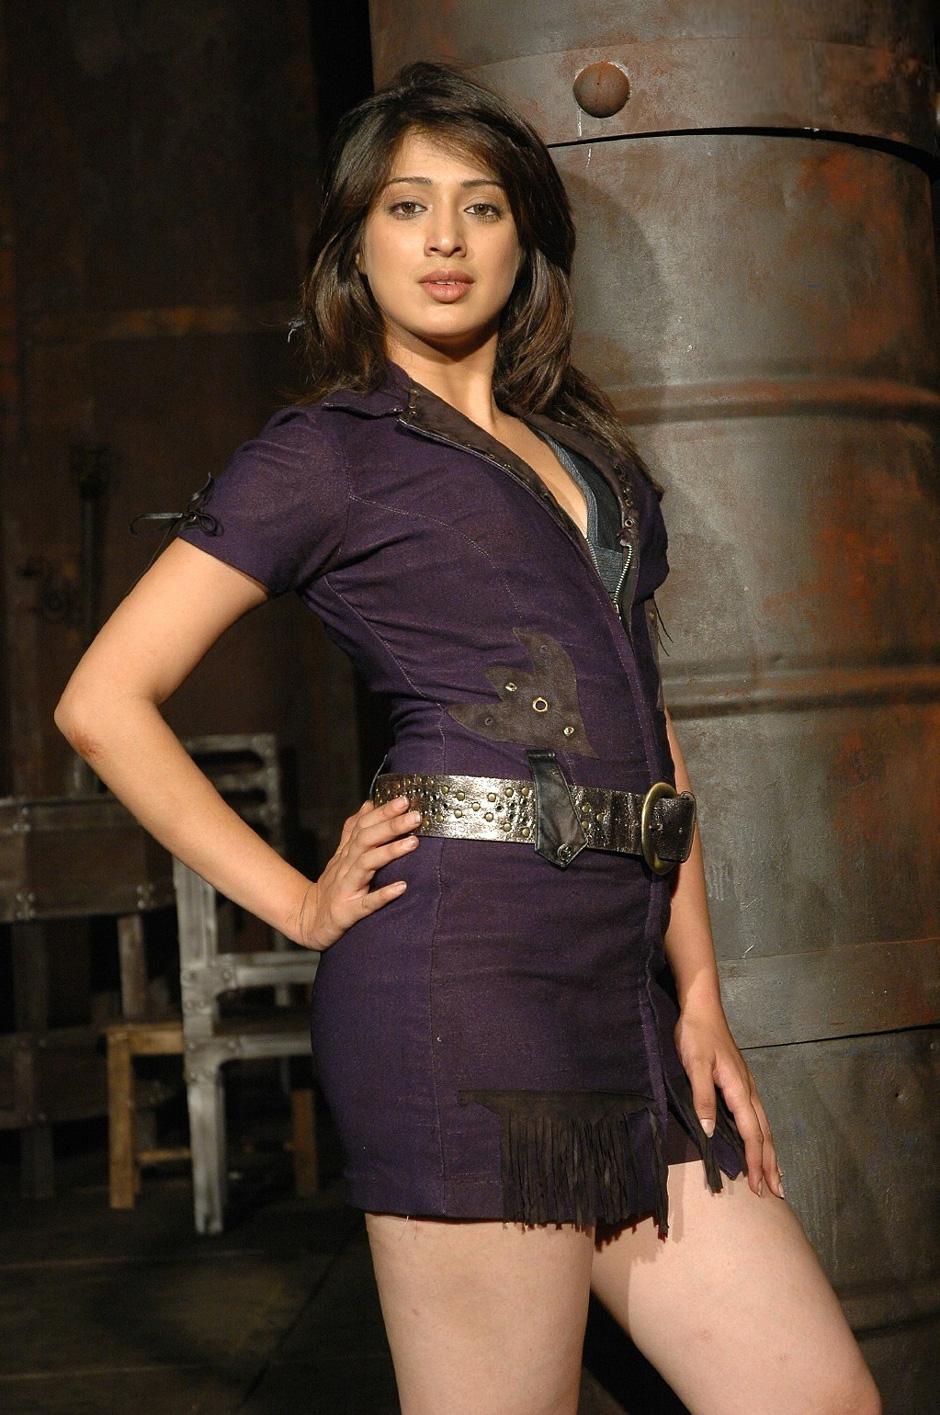 Film Actress Hot Pics Lakshmi Rai Rai Hot Thigh Show In Mini Skirt